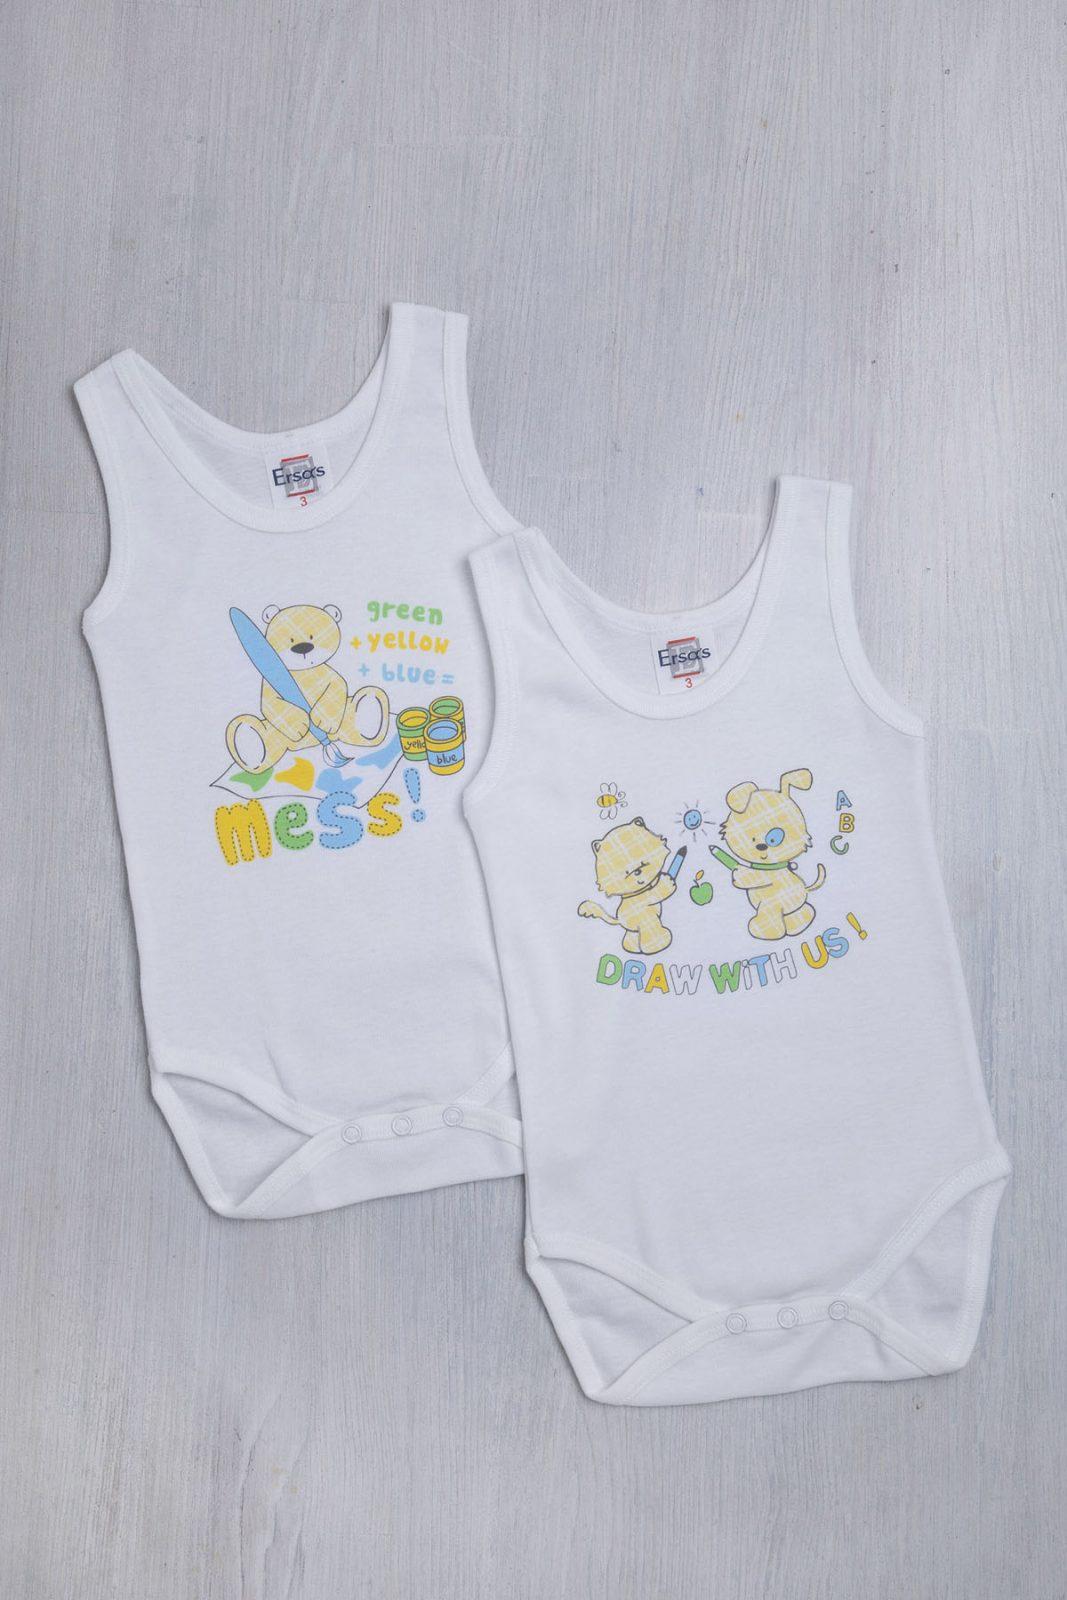 da074cfb8c9 Σετ φορμάκια για Αγόρια - Ersas Παιδικά, Βρεφικά Ρούχα